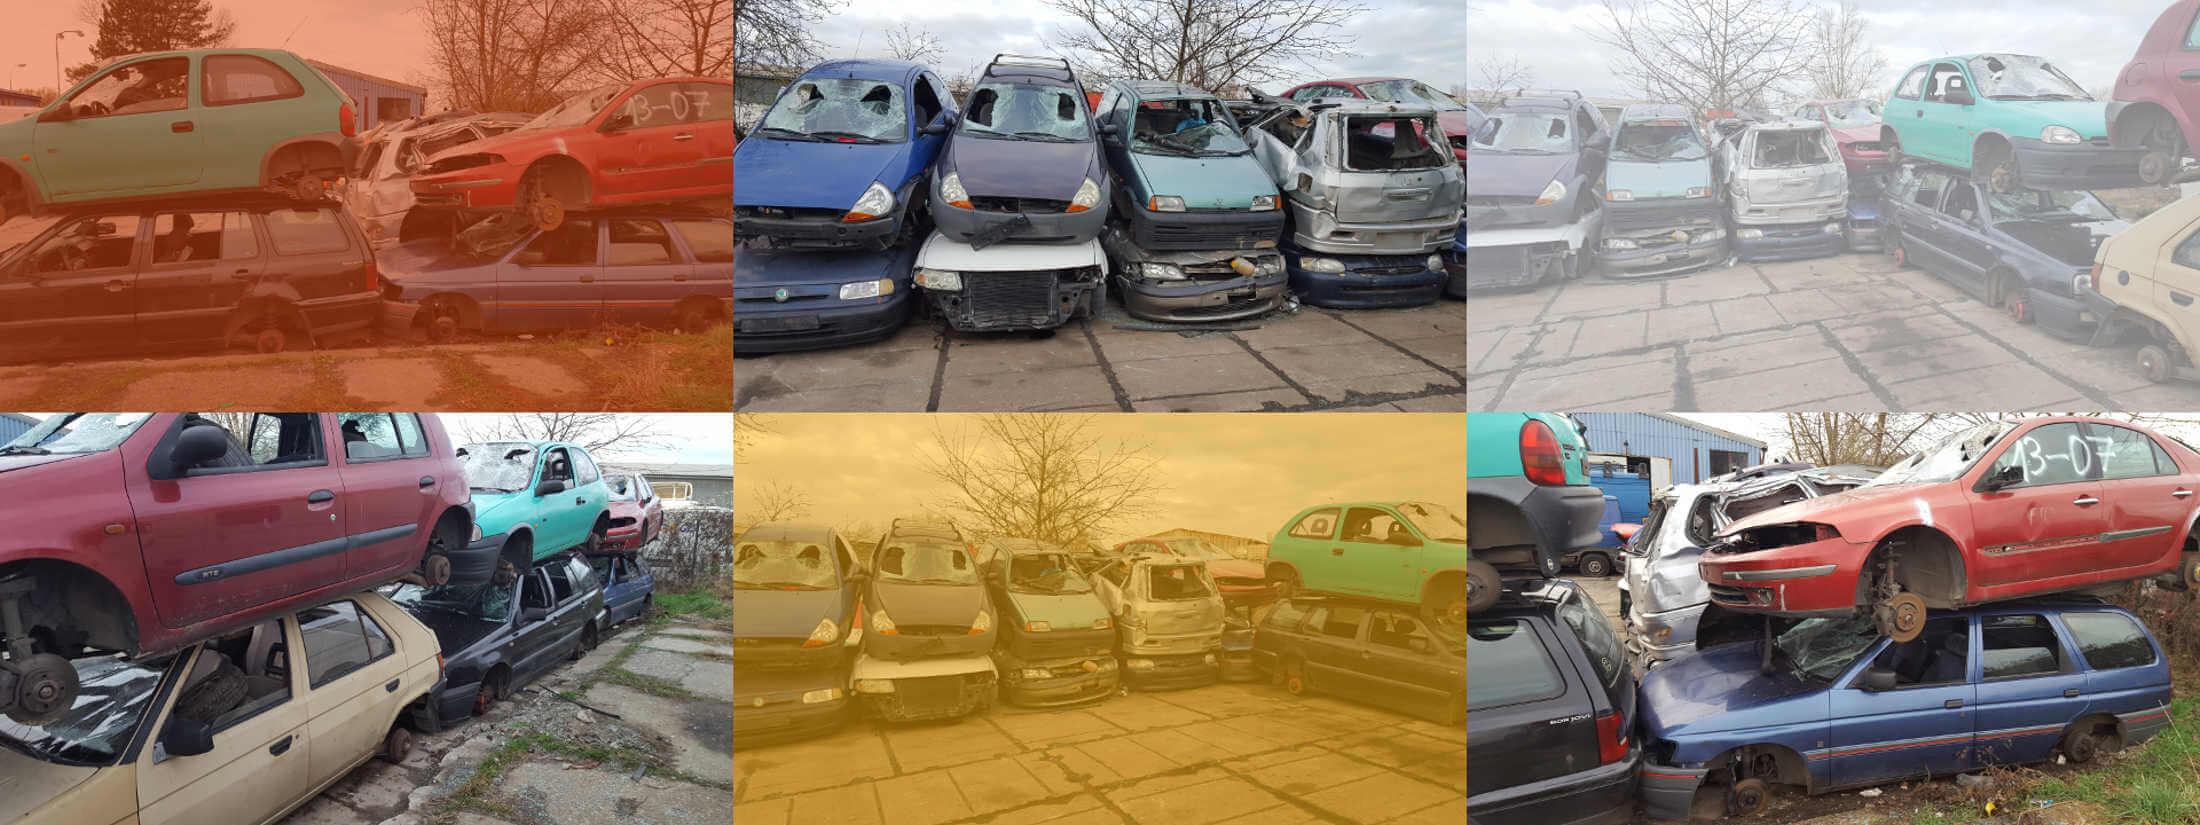 Výkup aut a likvidace autovraků